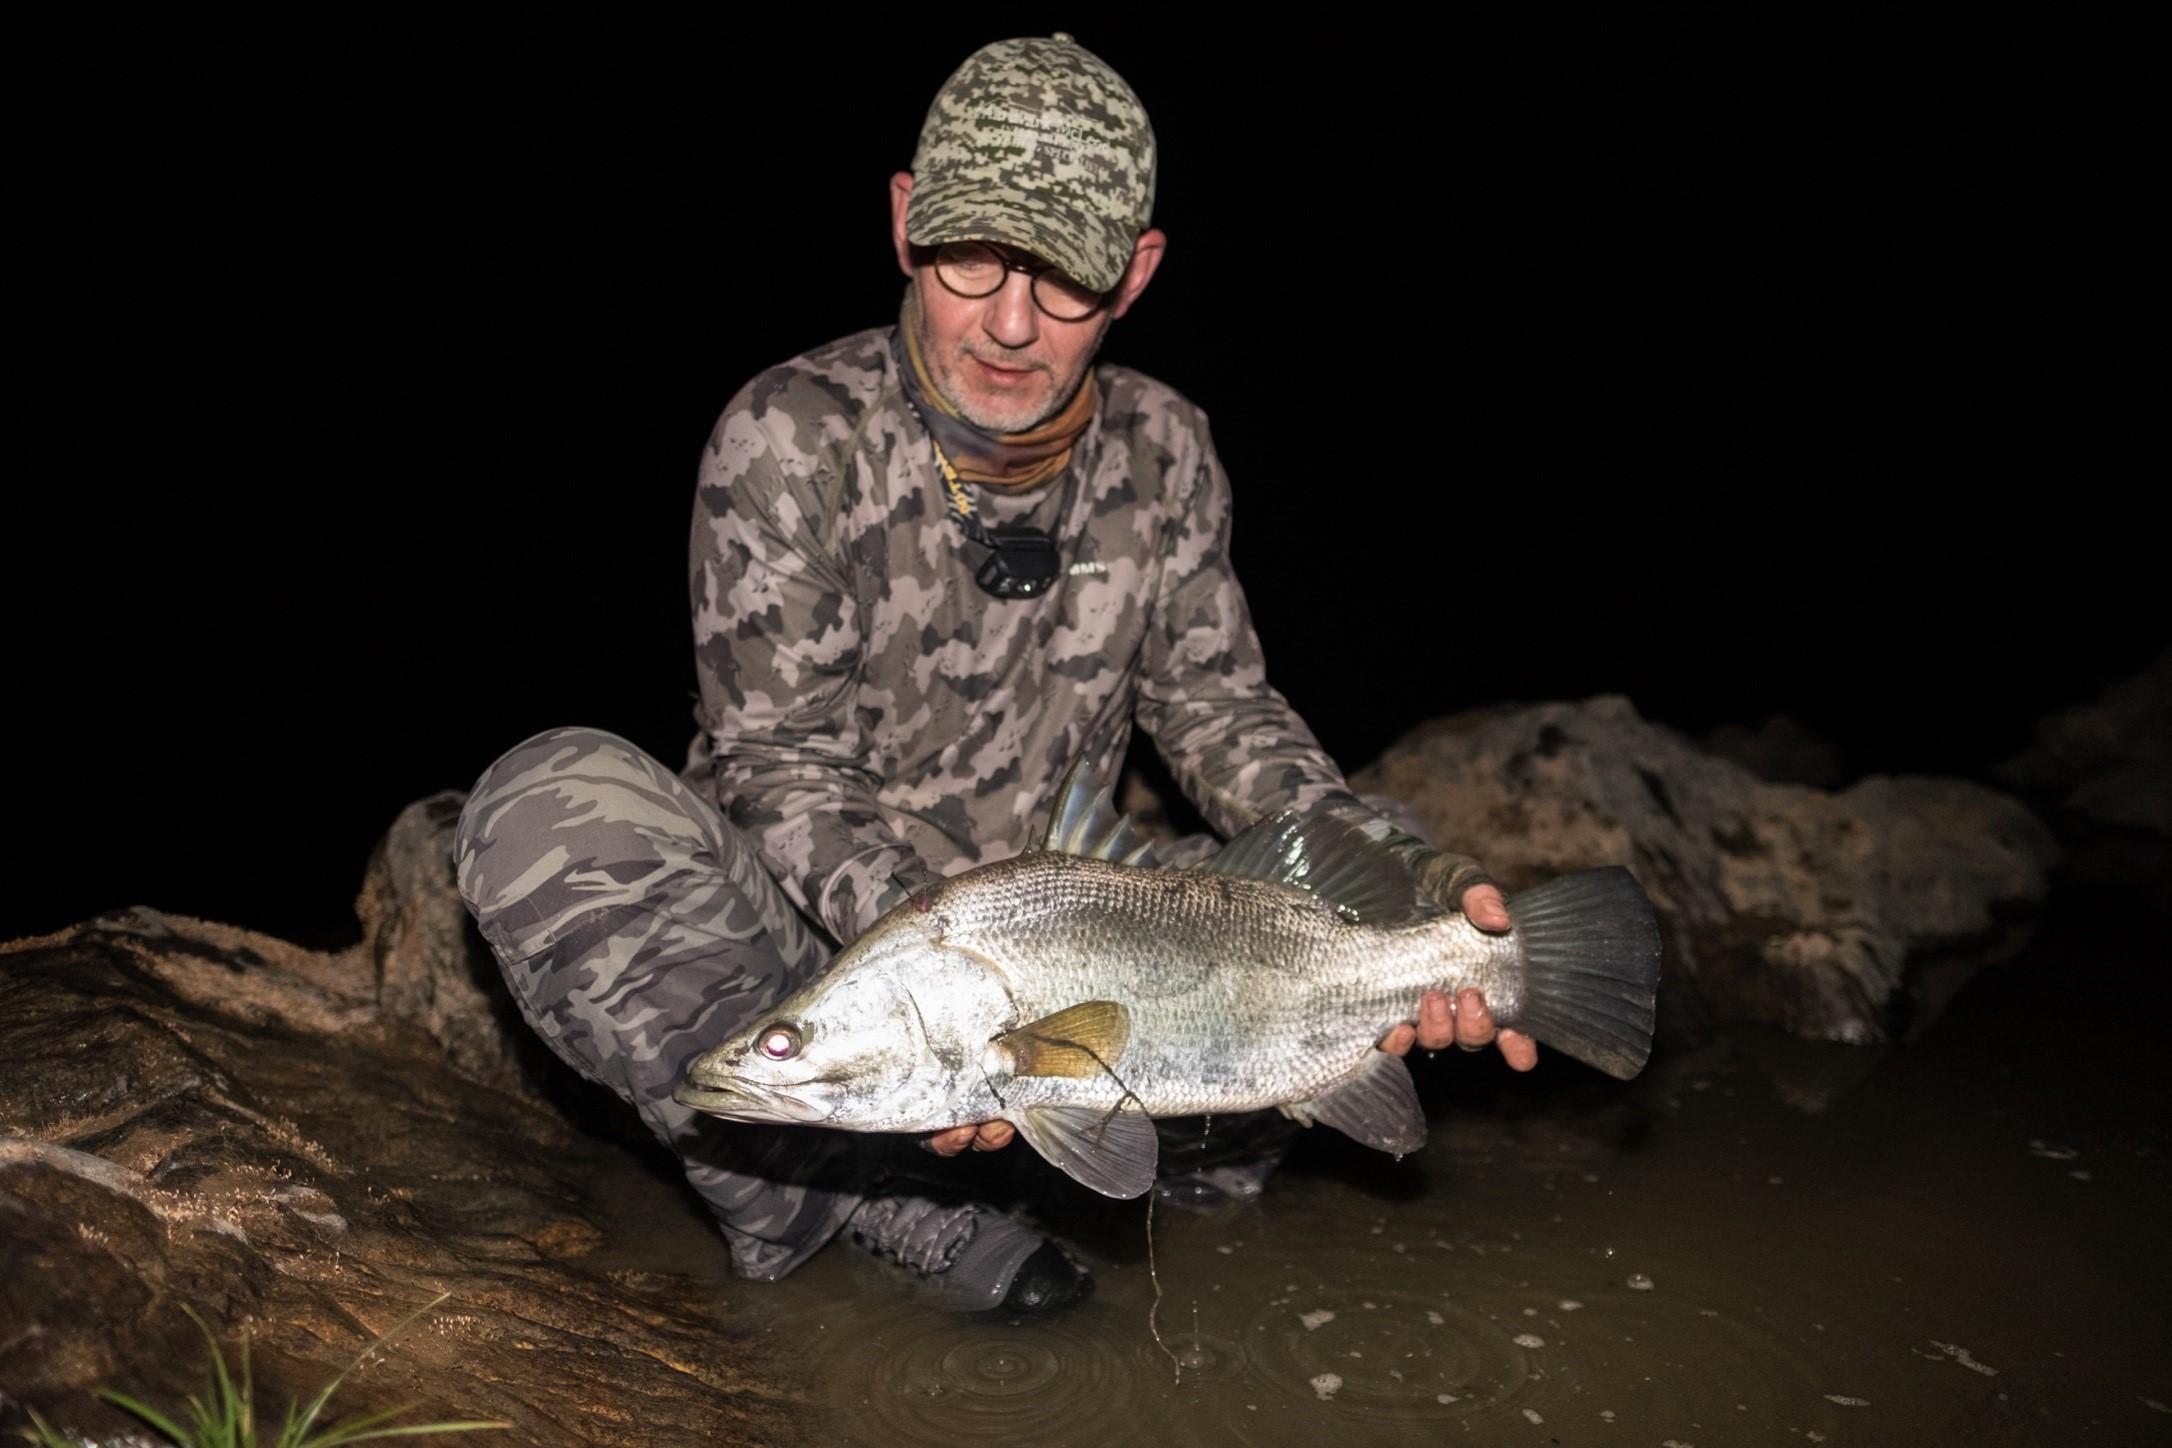 Cameroon, Nile Perch, Aardvark McLeod, Charlotte Chilcott, fishing for Nile Perch, fishing for Tigerfish